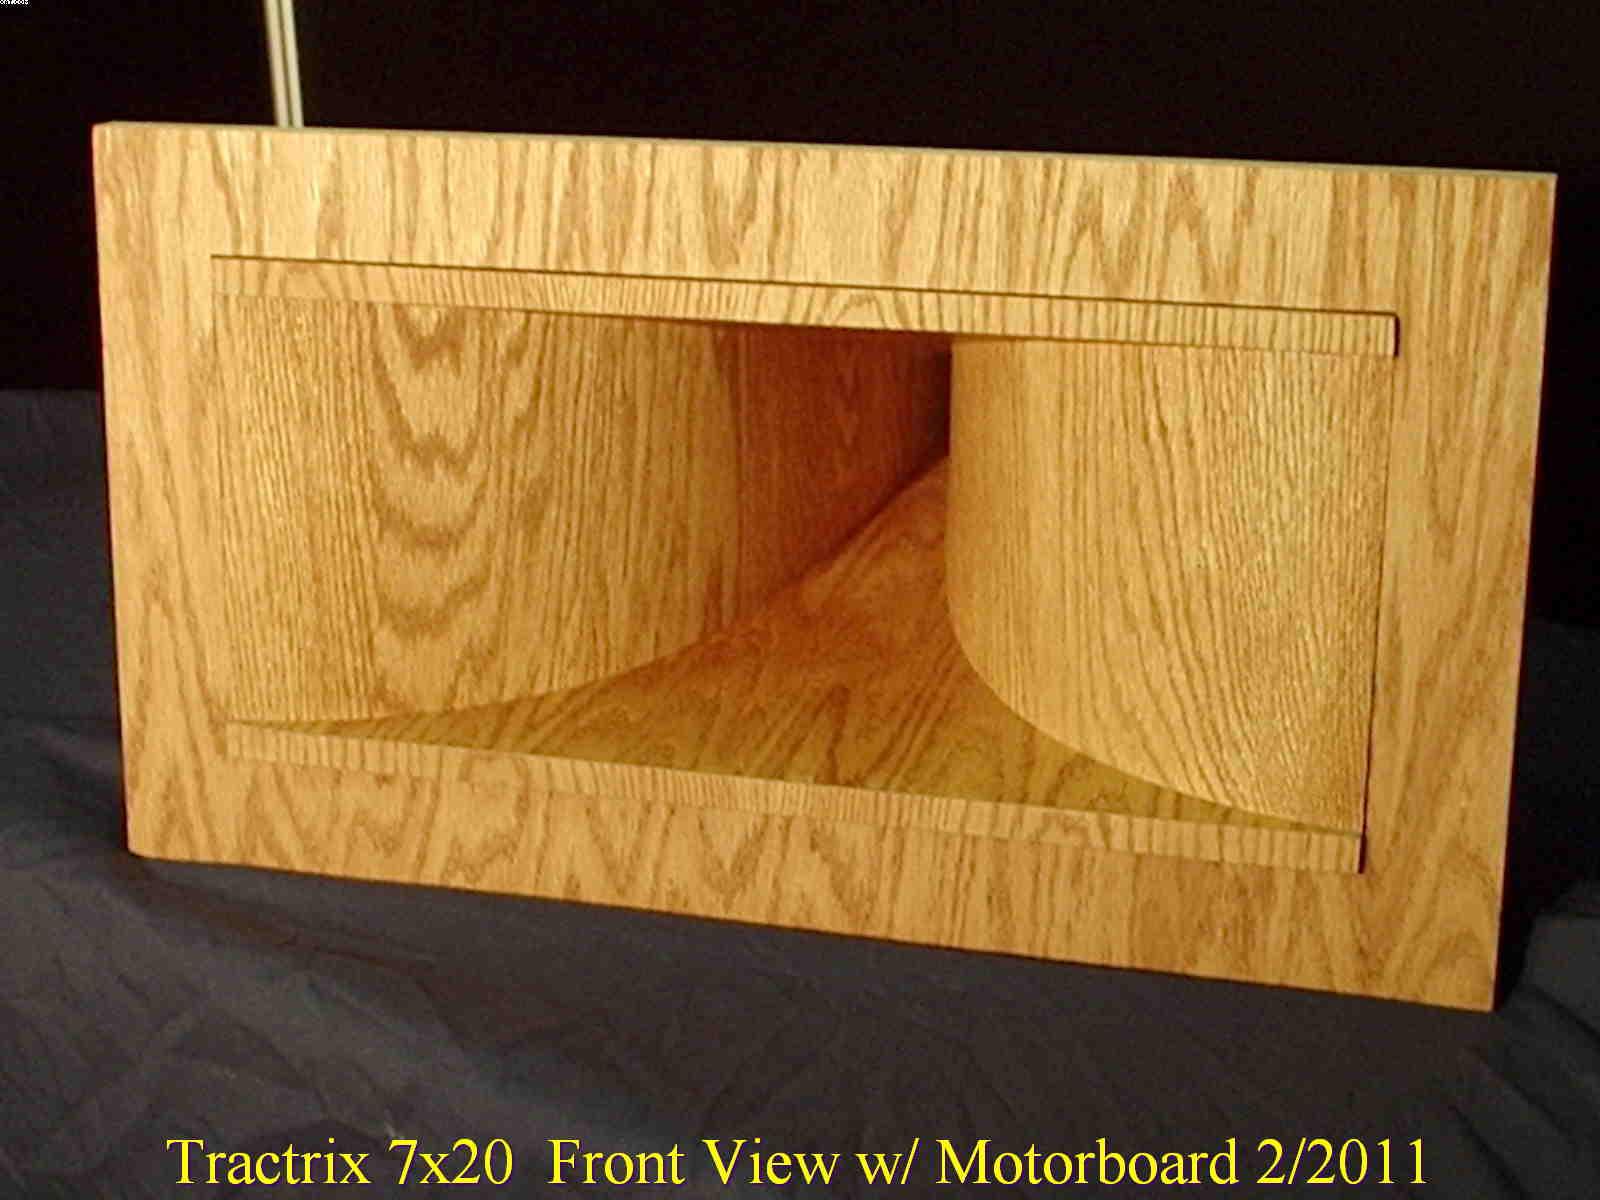 Cornscala / Wooden Tractrix Horn Build  - Technical